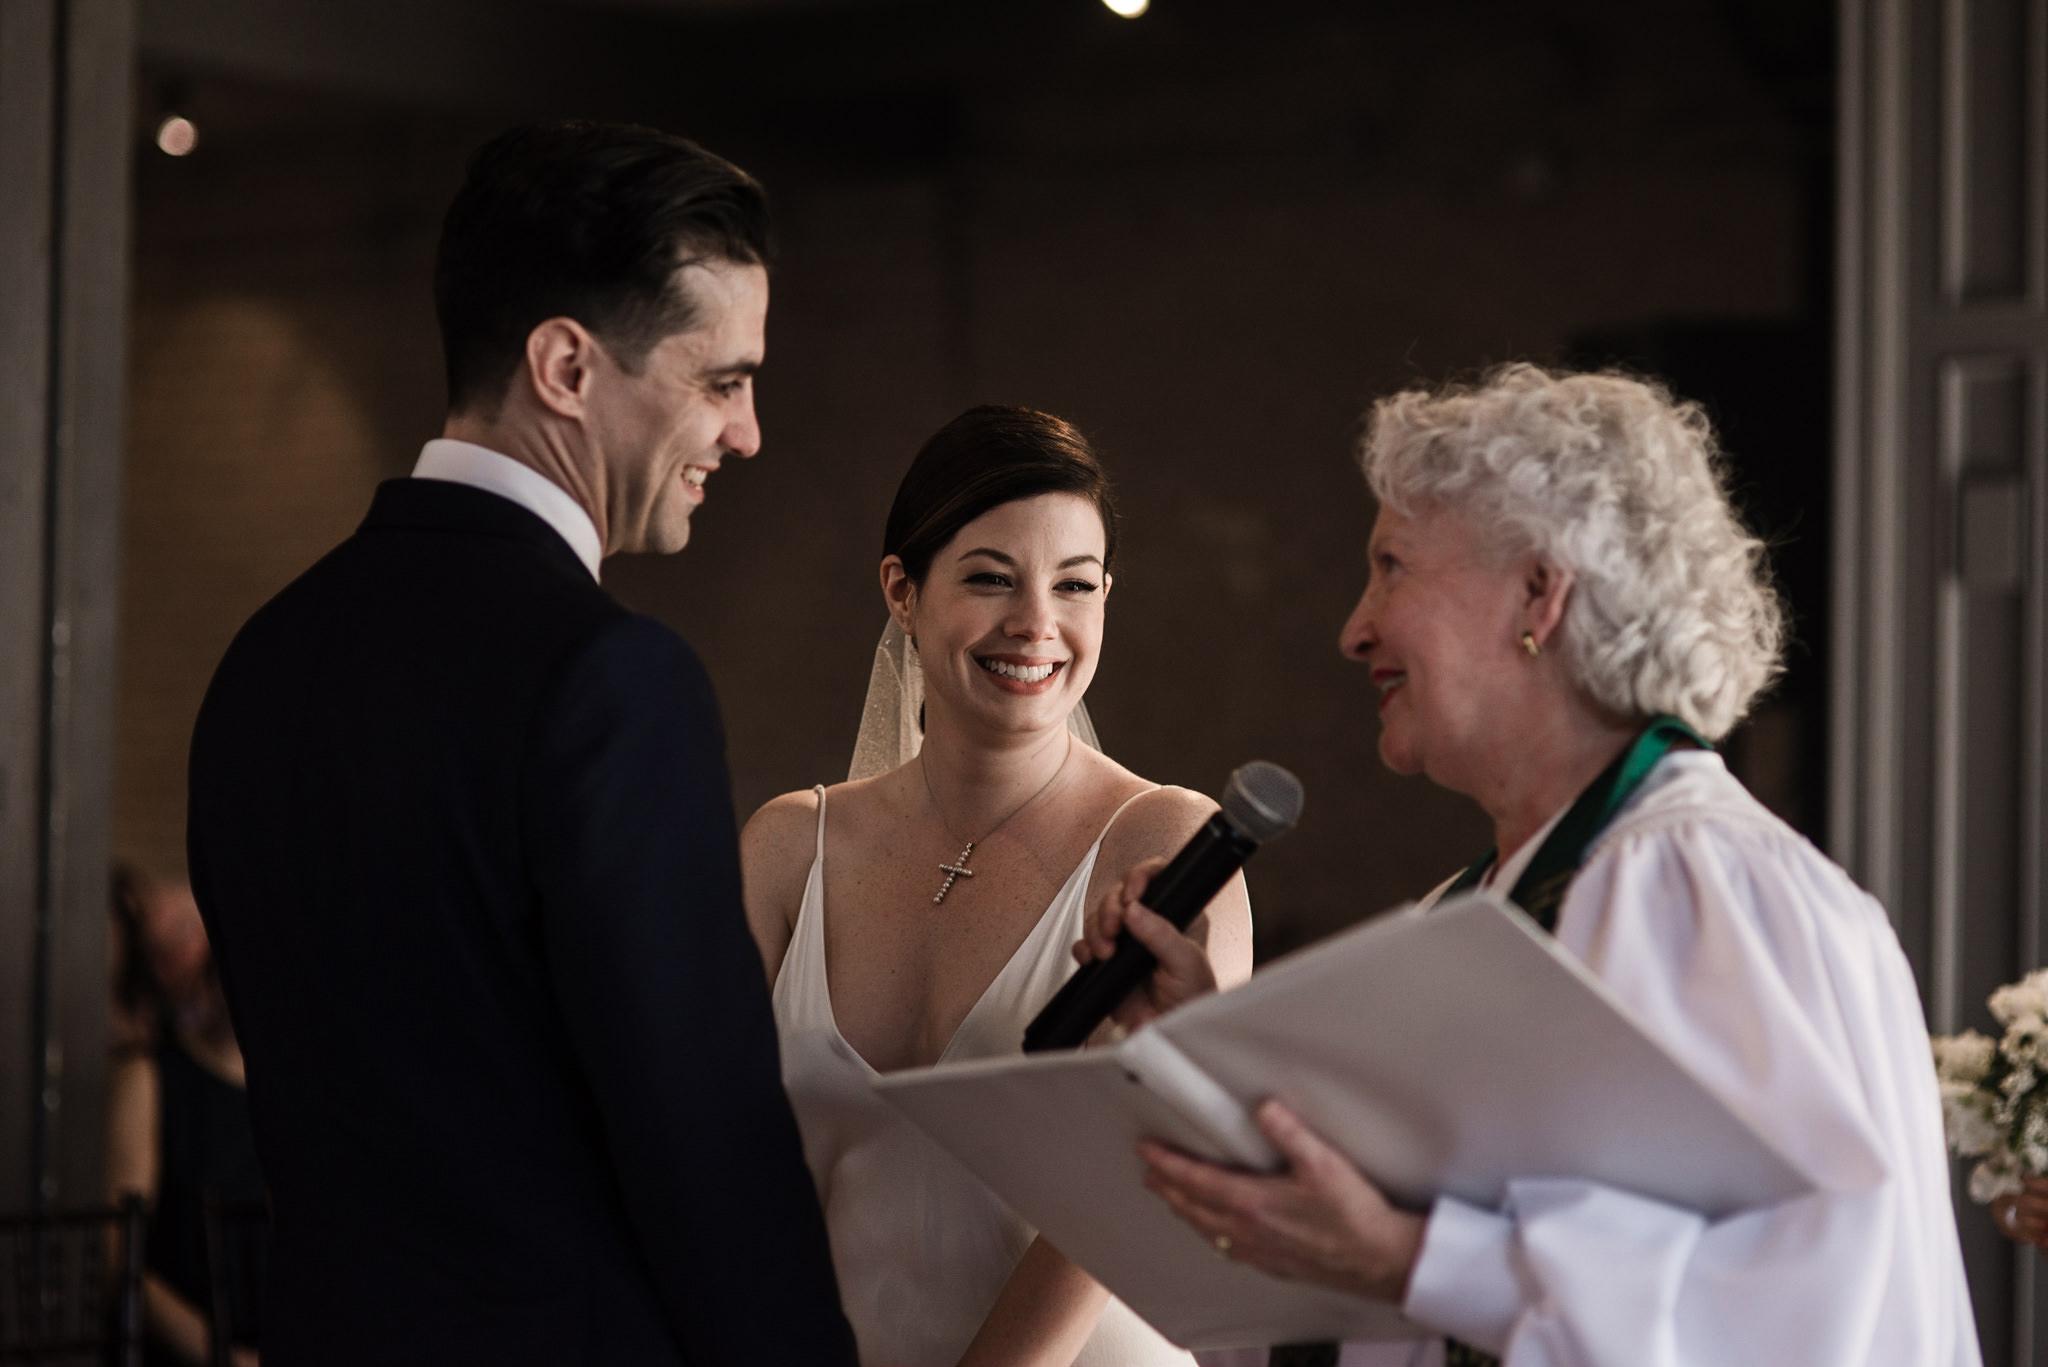 102-wedding-ceremony-storys-building-toronto-photographer-documentary.jpg